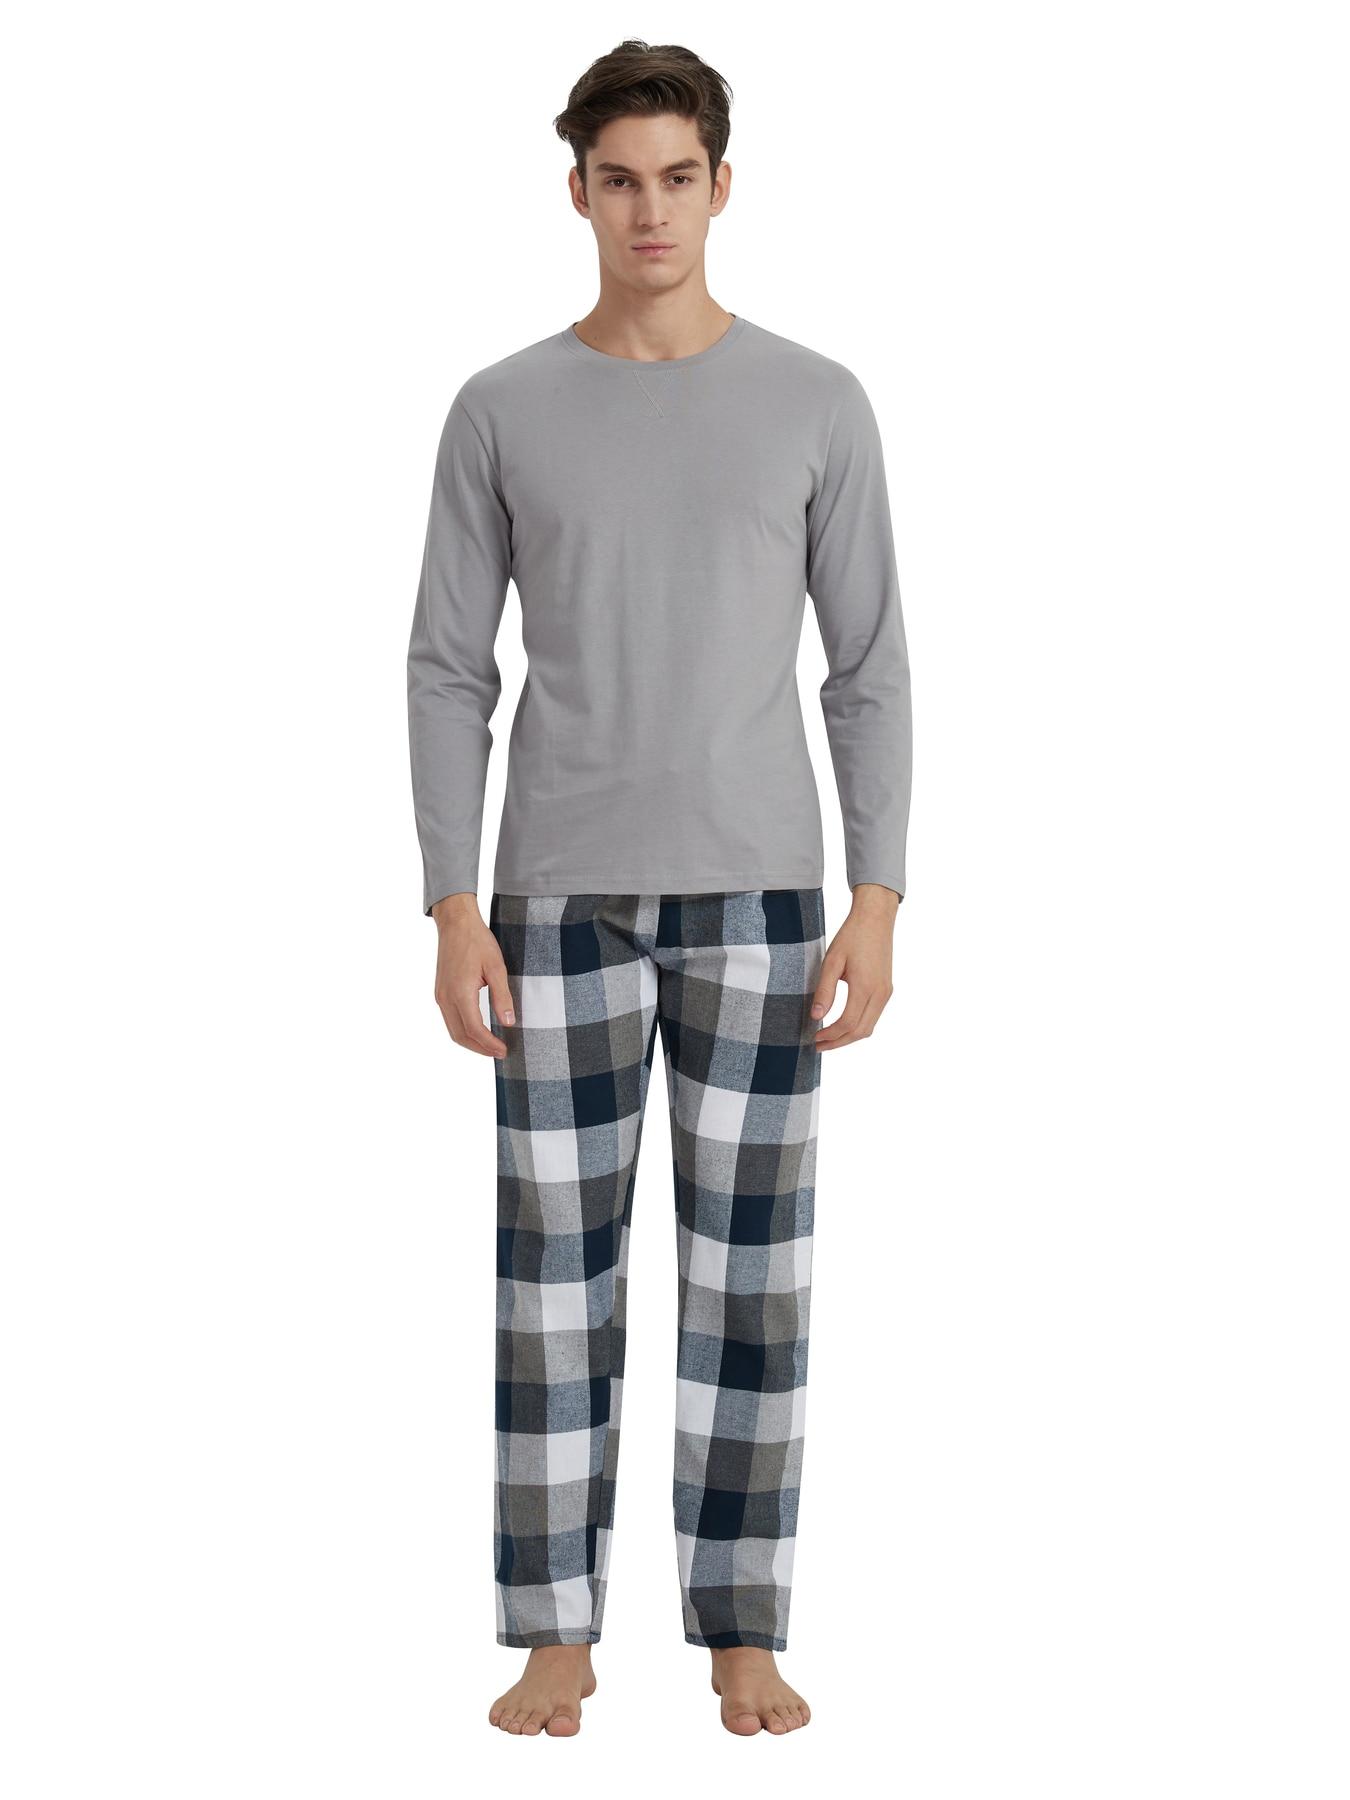 PimpamTex-Man Pajamas 100% Cotton Flannel Long Sleeve And Pants Long-